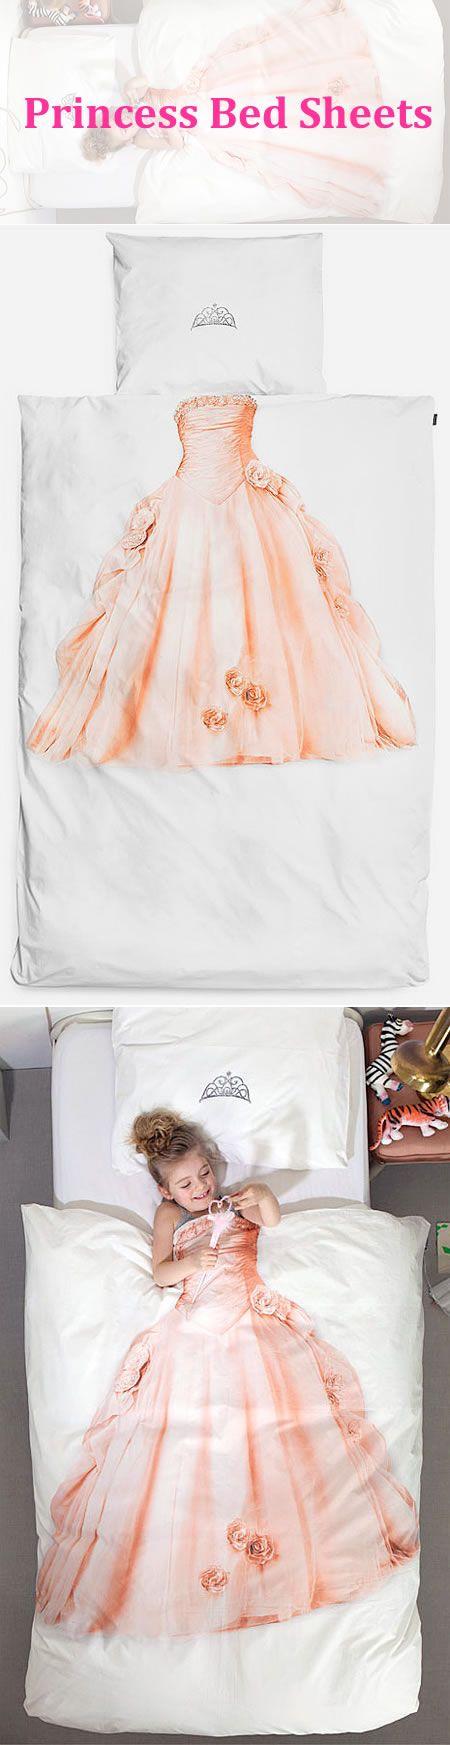 cool design princess bed sheets